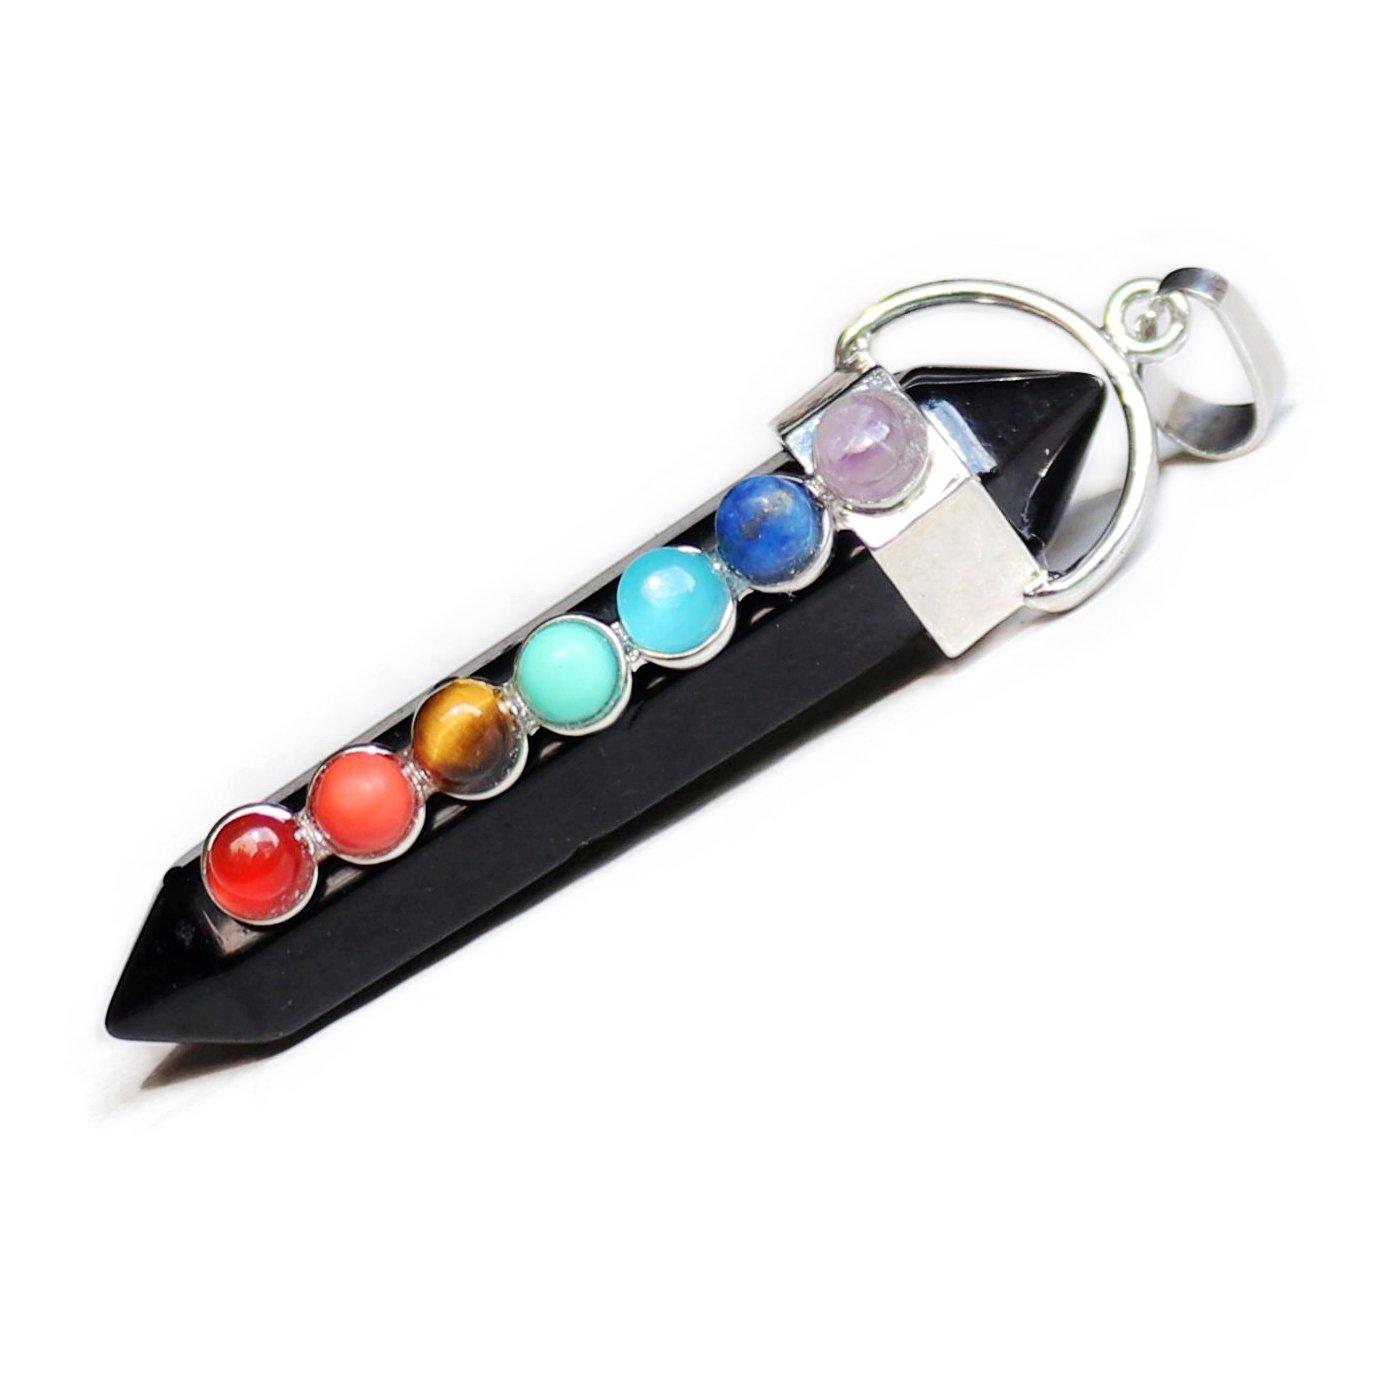 Aituo magn/ífico cristal de cuarzo piedras de curaci/ón Point chakra Cut Gemstone Natural colgantes de piedra para collar joyer/ía Making